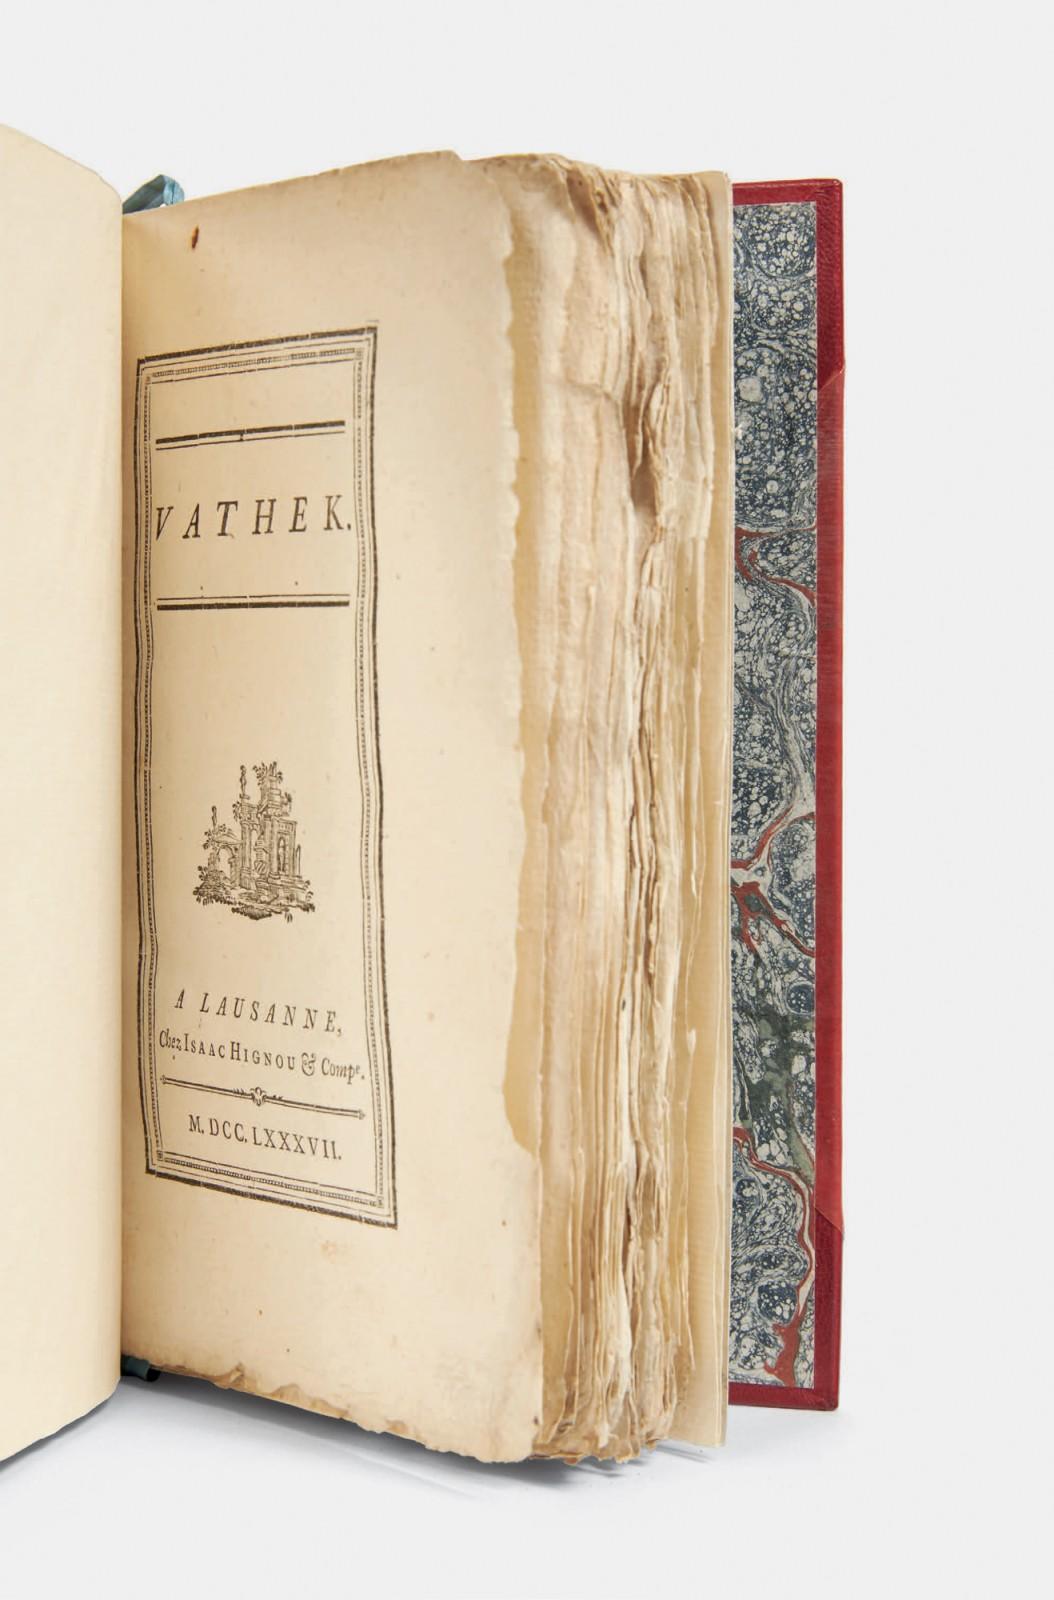 beckford-william-vathek-lausanne-isaac-hignou-comp-1787-recte-1786--189